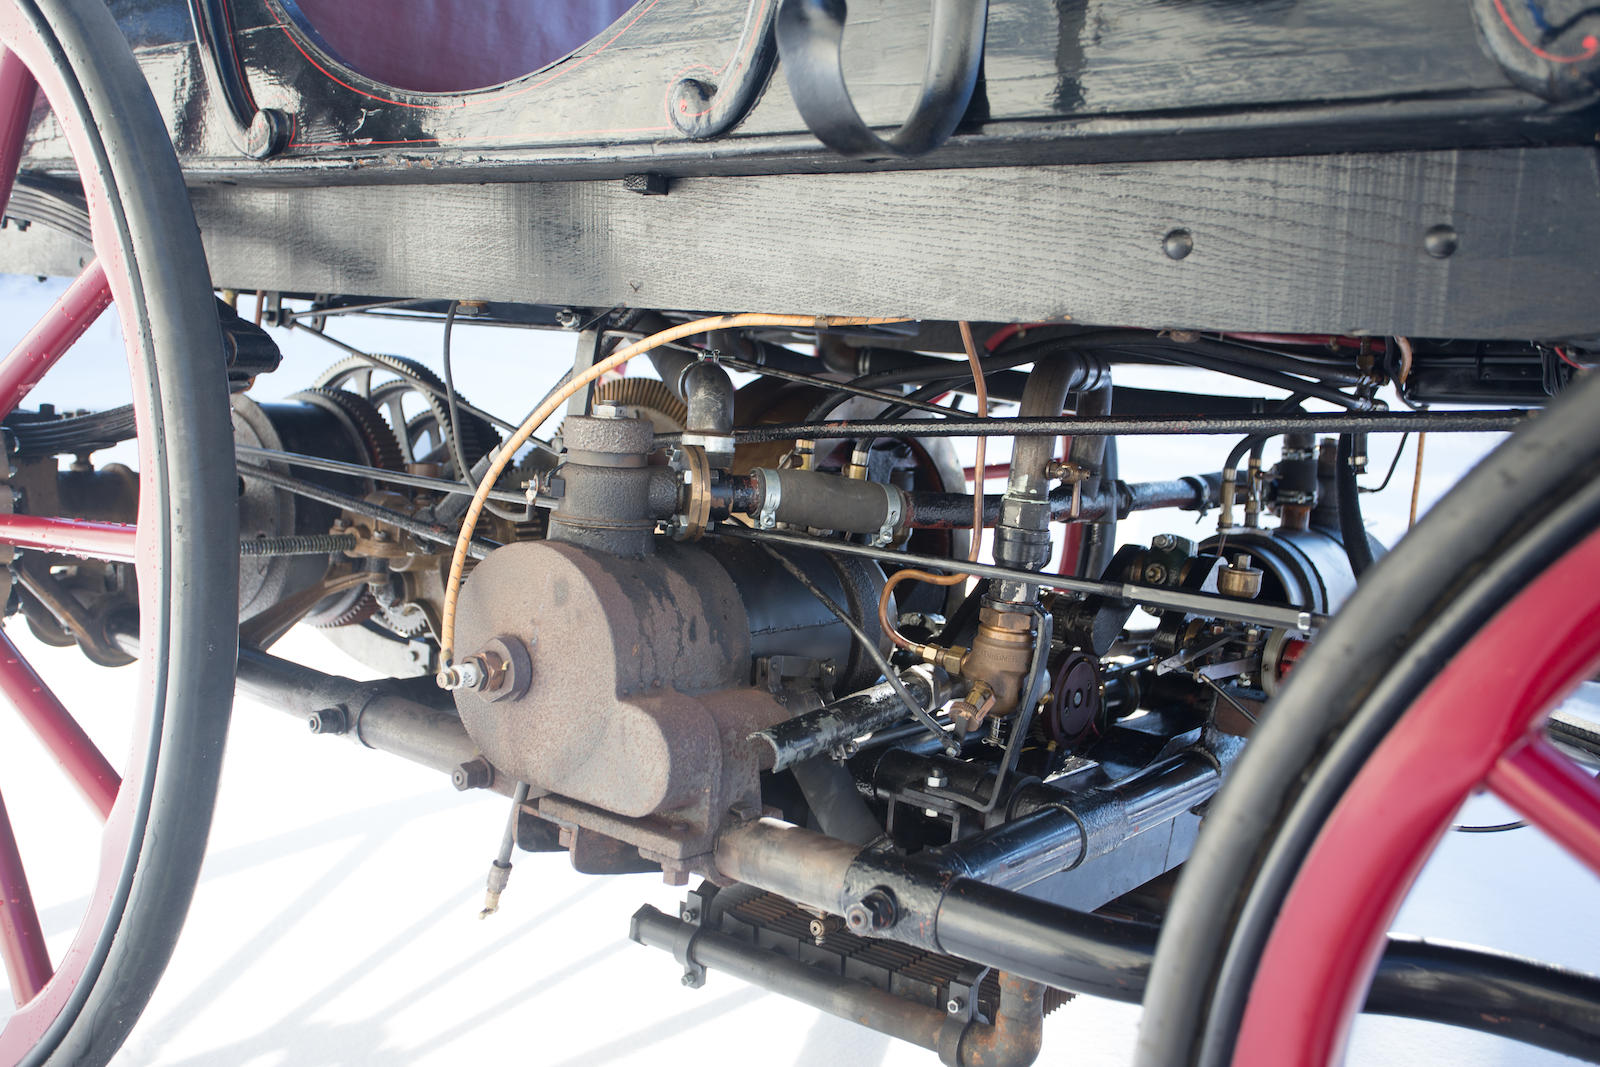 1896 Armstrong Phaeton Gasoline Electric Hybrid